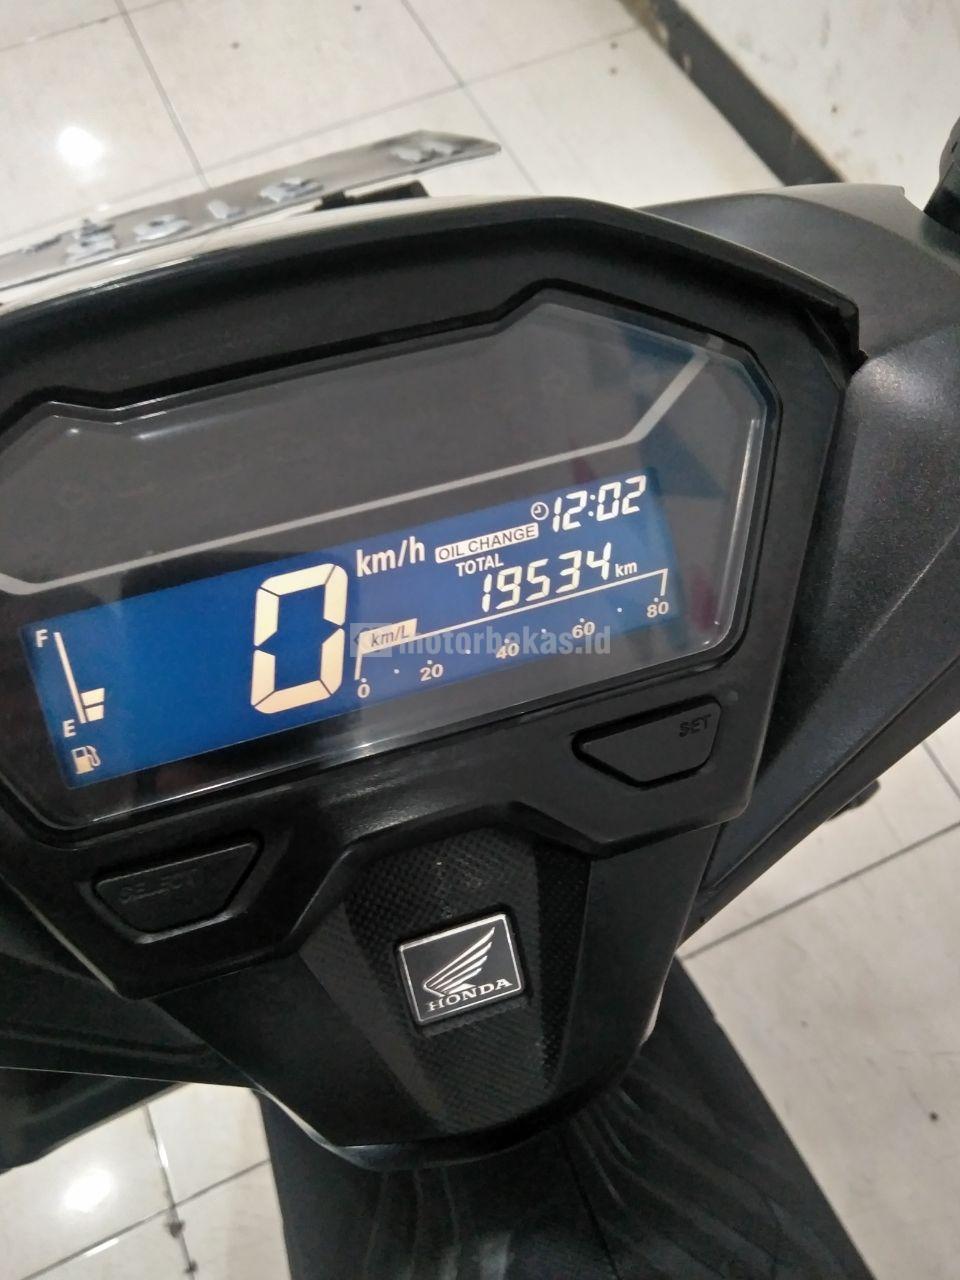 HONDA VARIO 150 SPORTY  3454 motorbekas.id